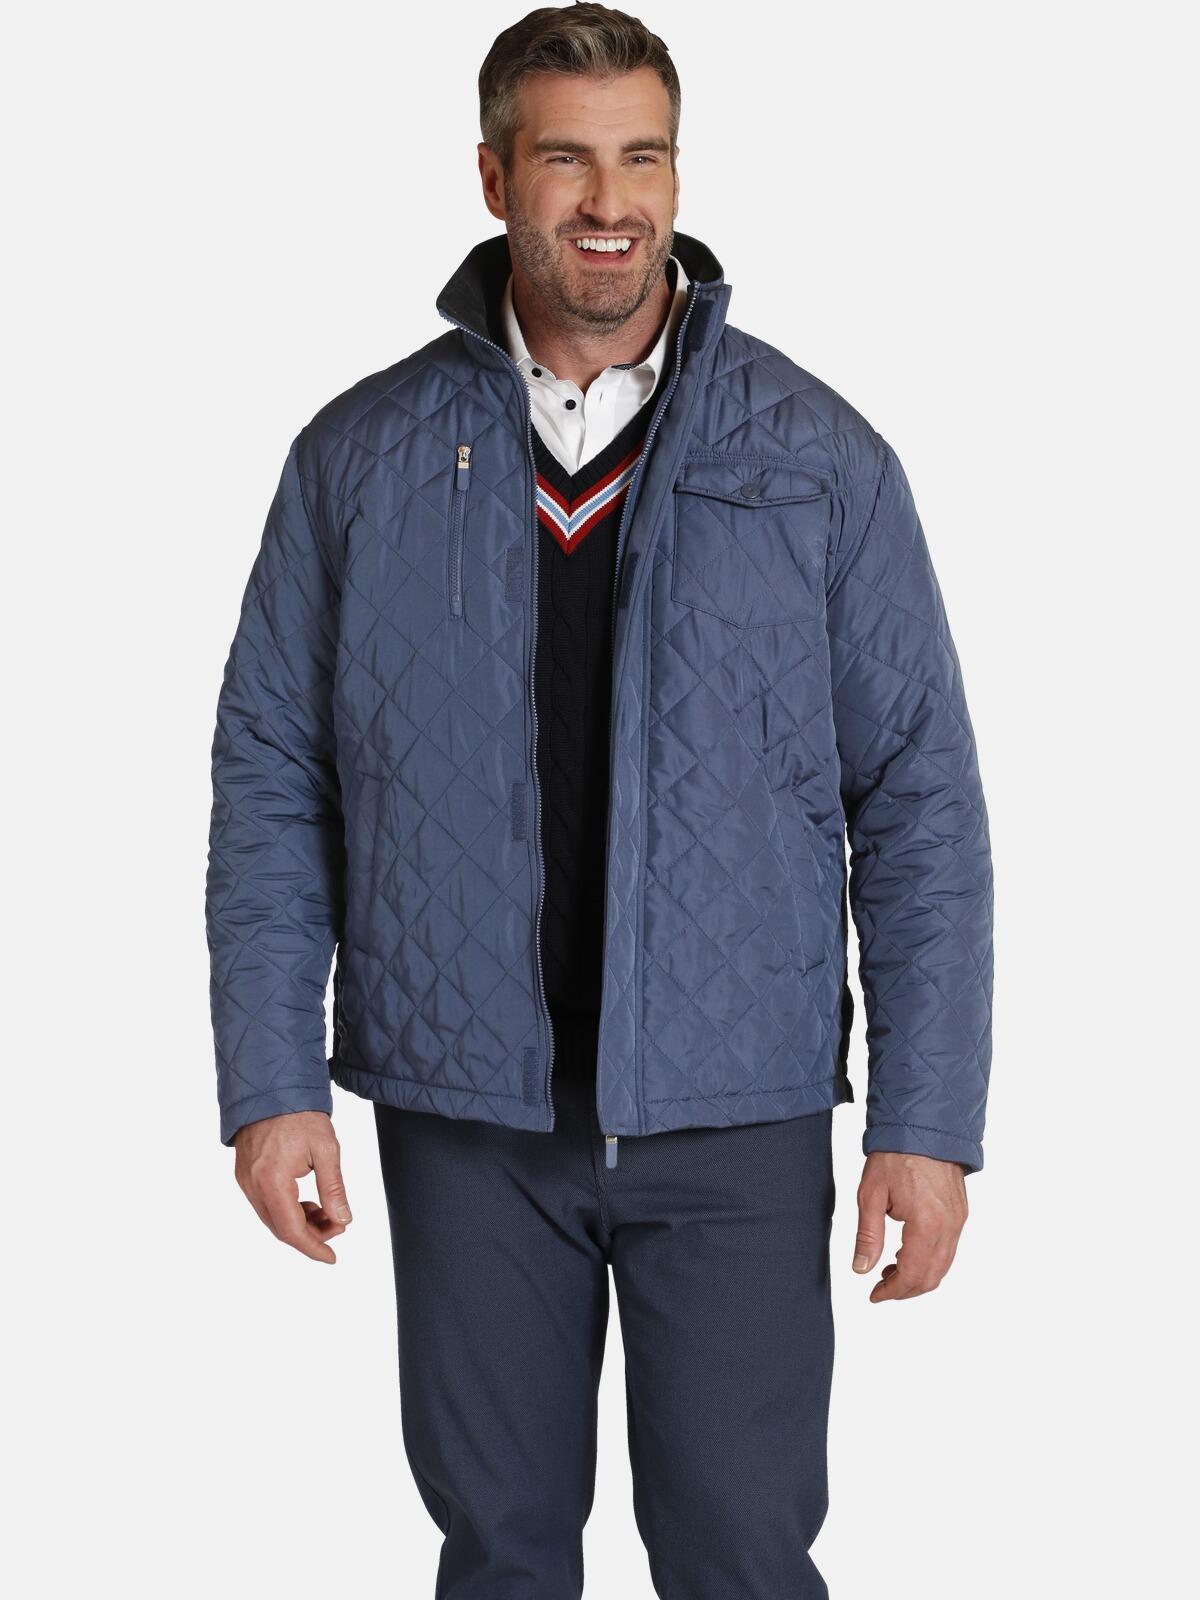 charles colby -  Steppjacke SIR CYNFARCH, warm wattiert, viele Taschen